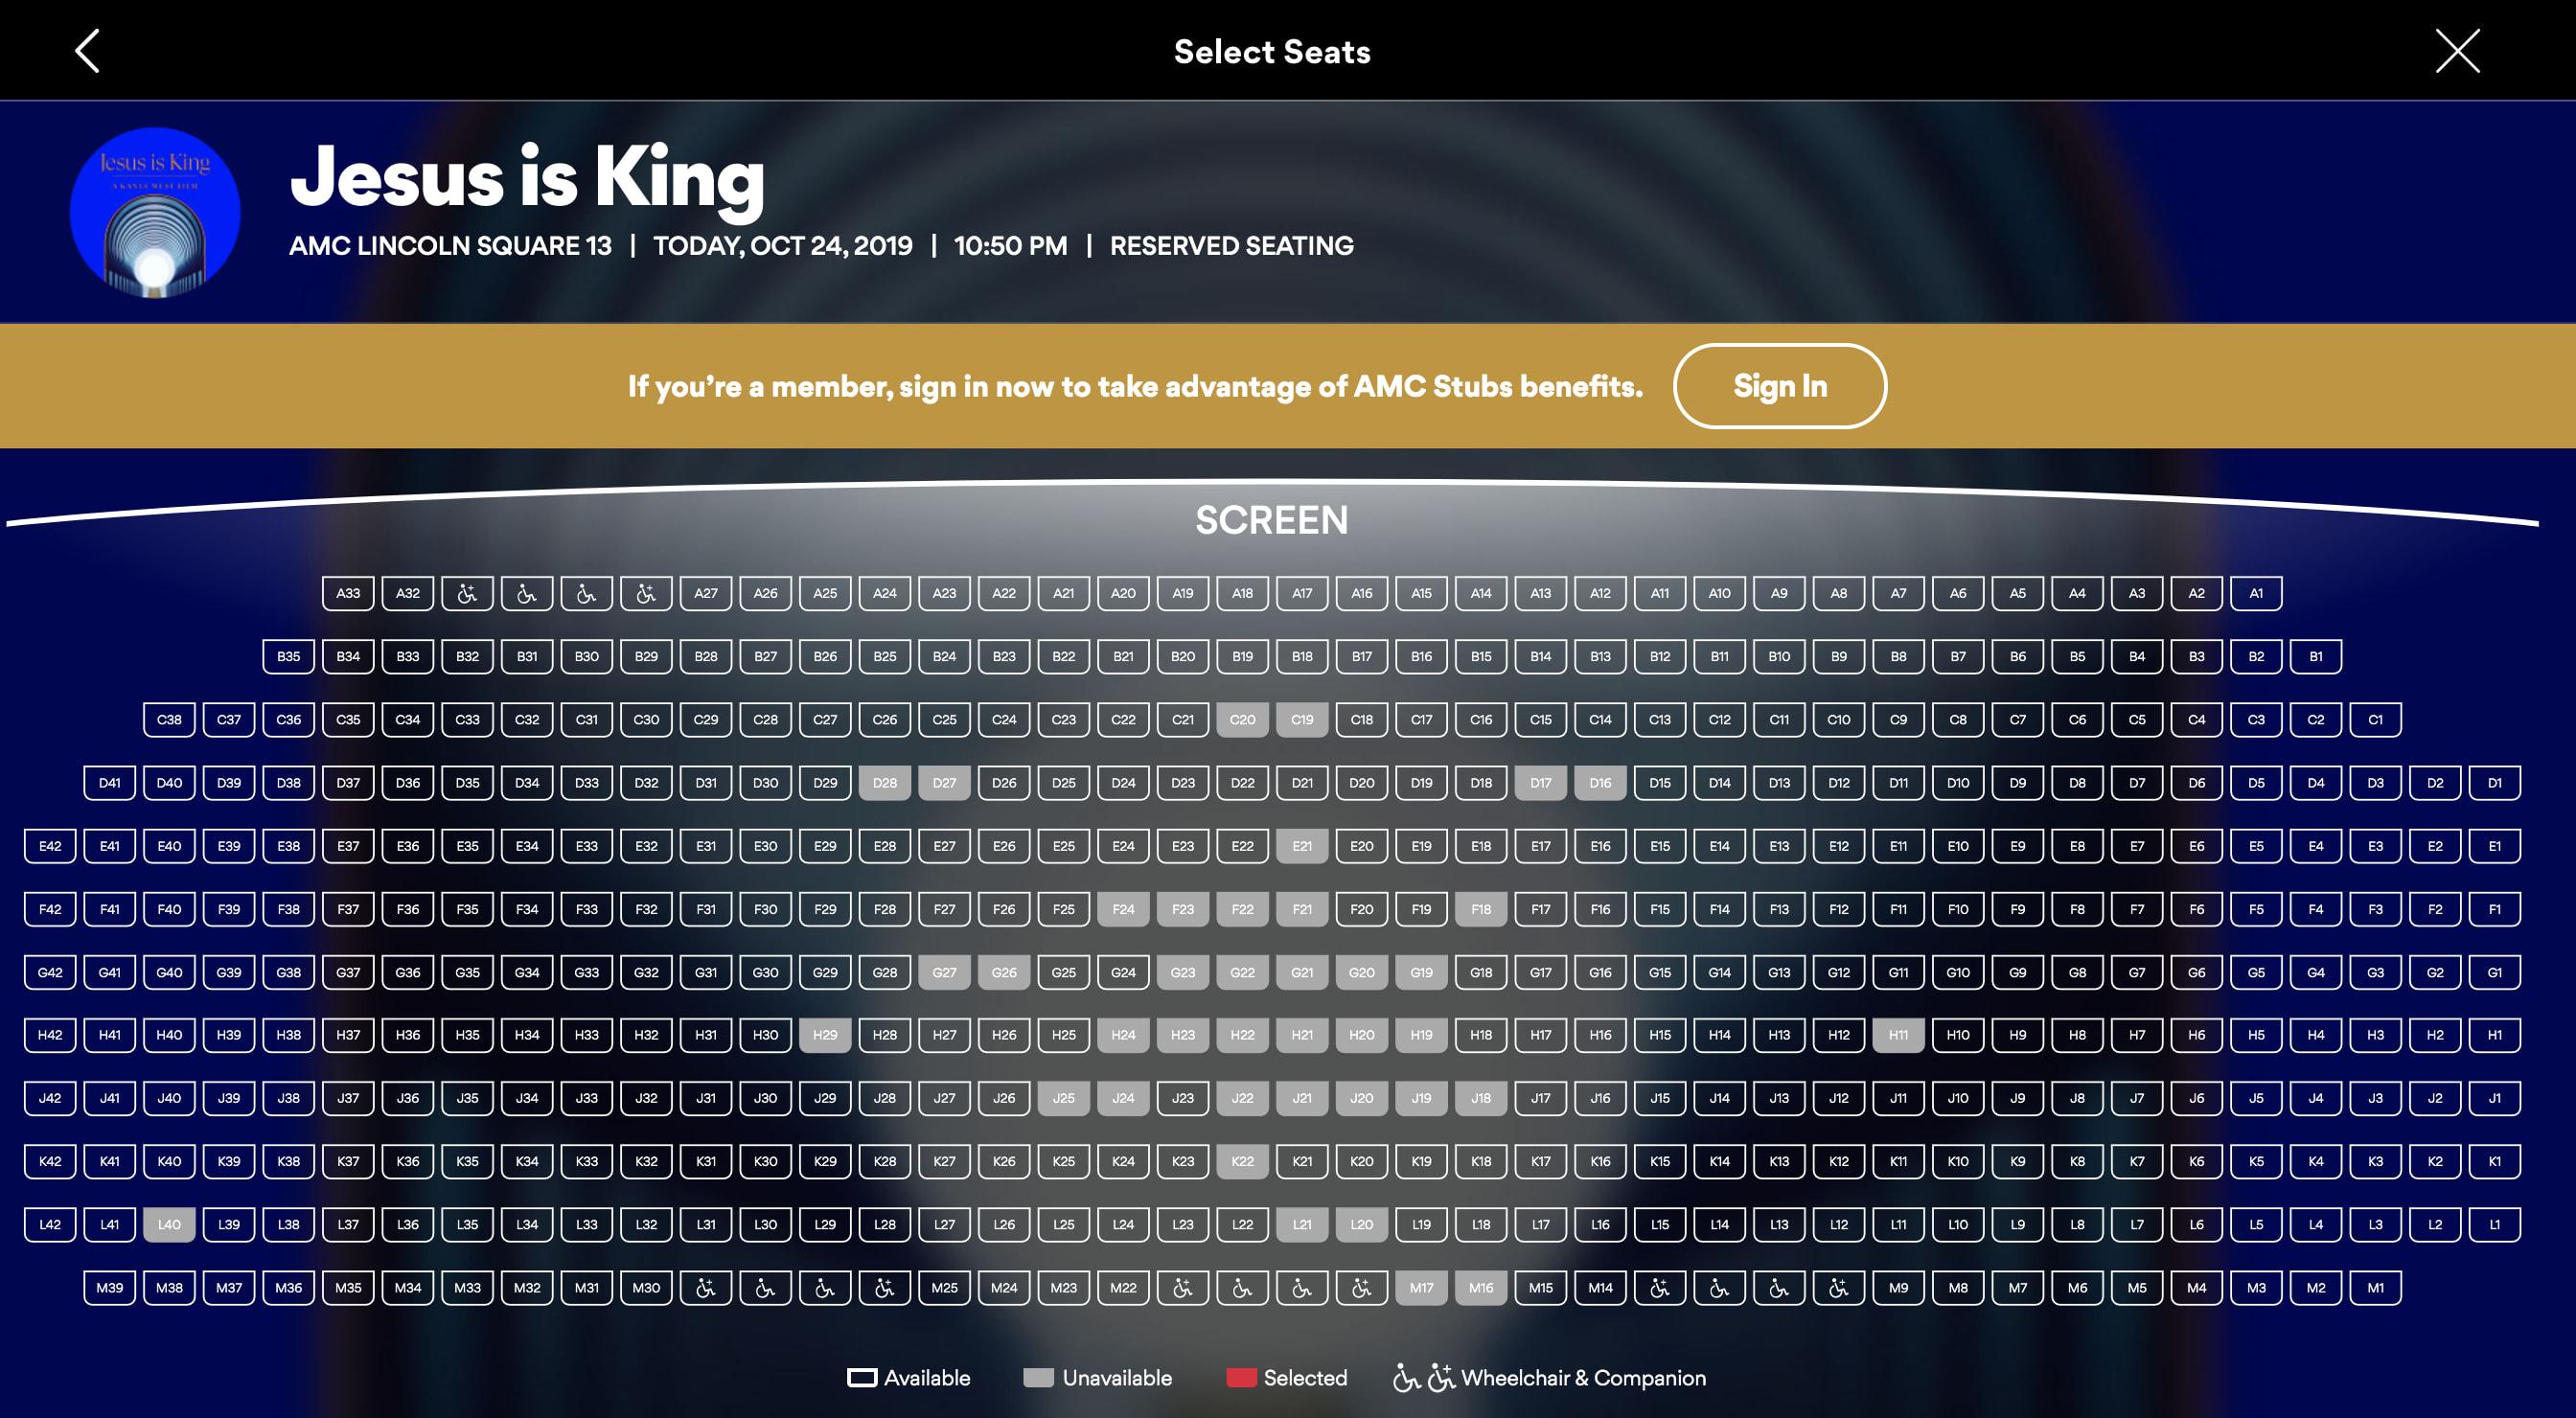 Jesus Is King IMAX seat chart opening night